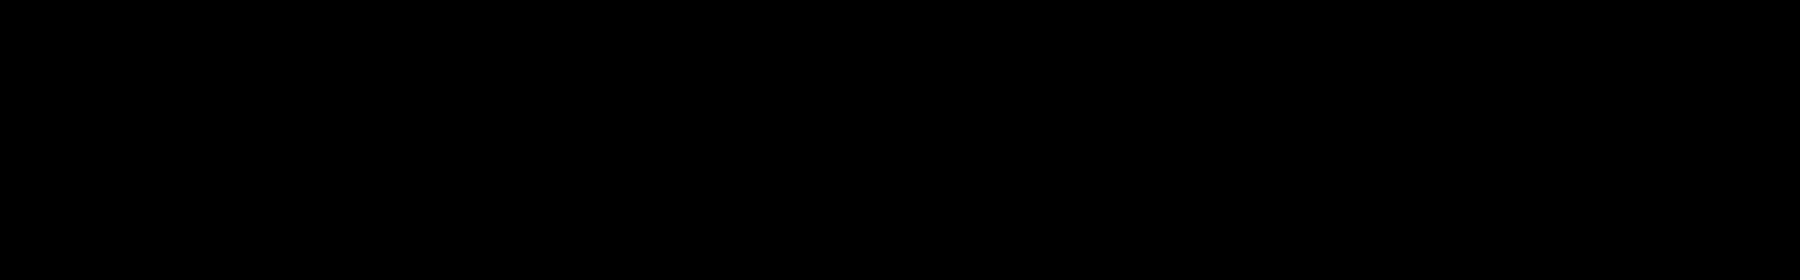 Calculate Vol.3 audio waveform